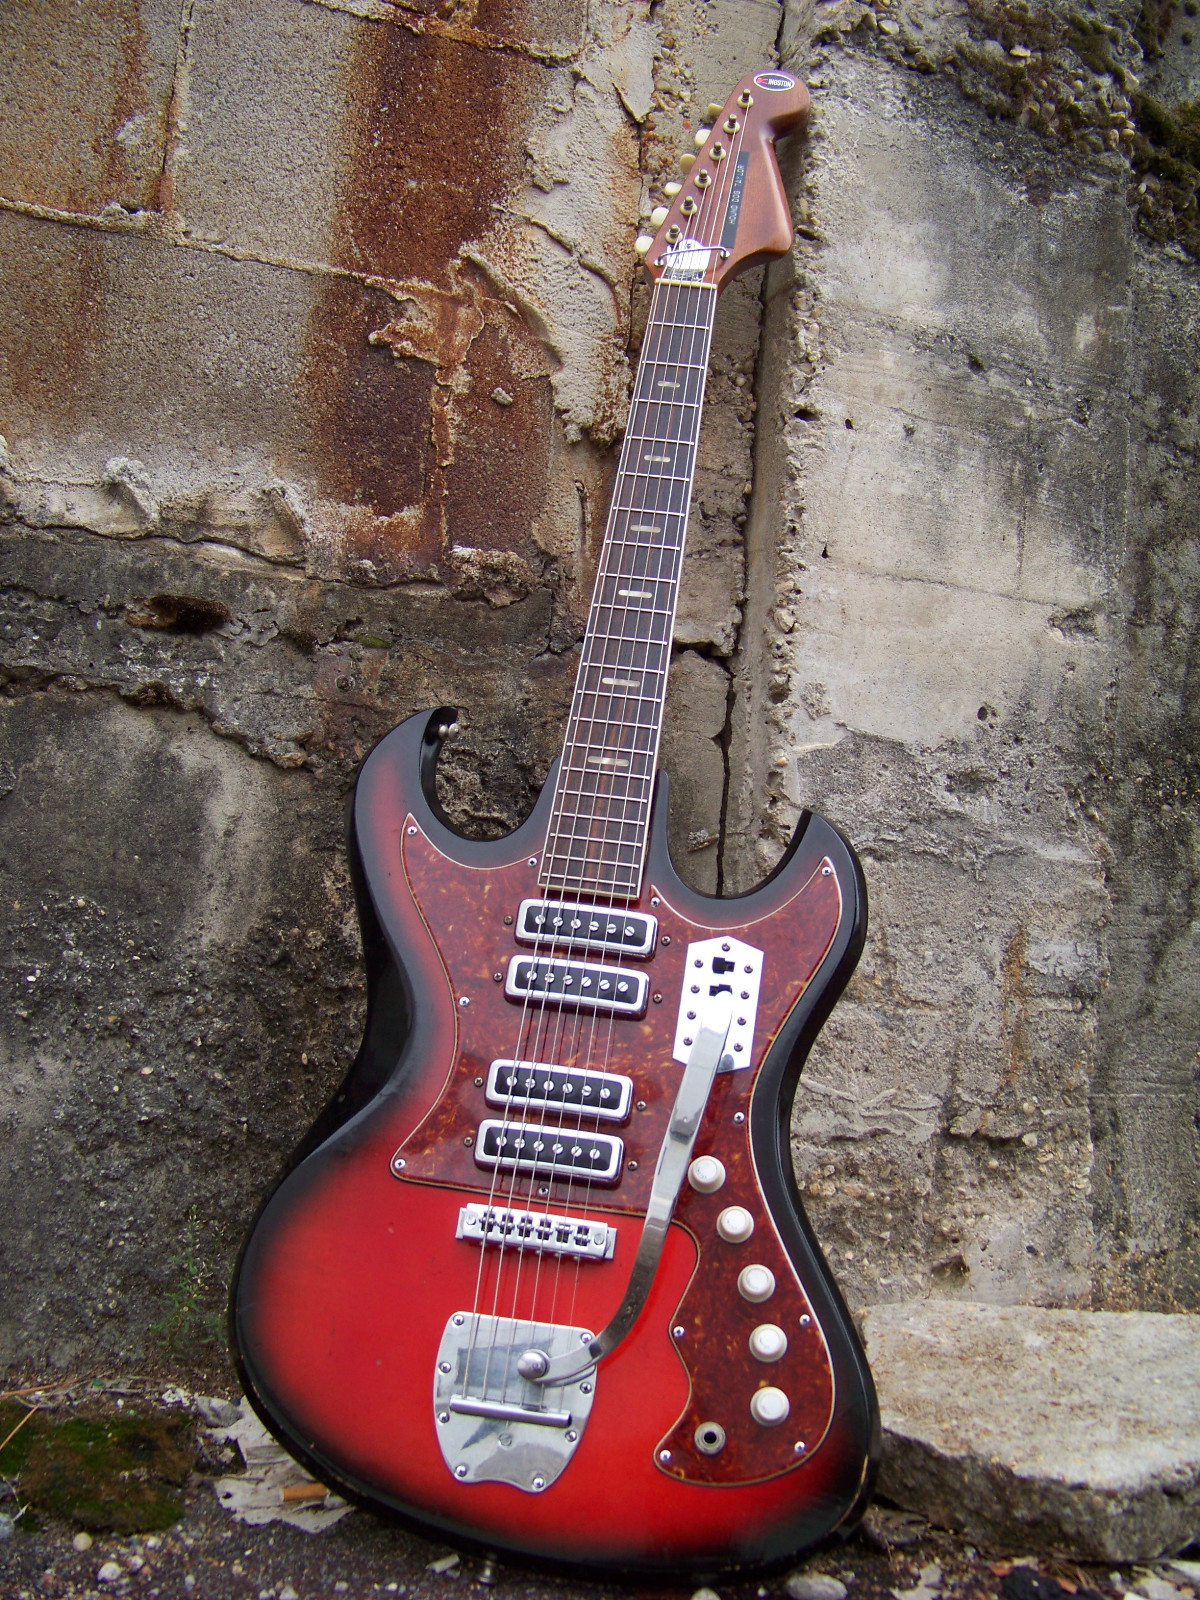 hight resolution of the genuine hound dog taylor kawai teisco electric guitar